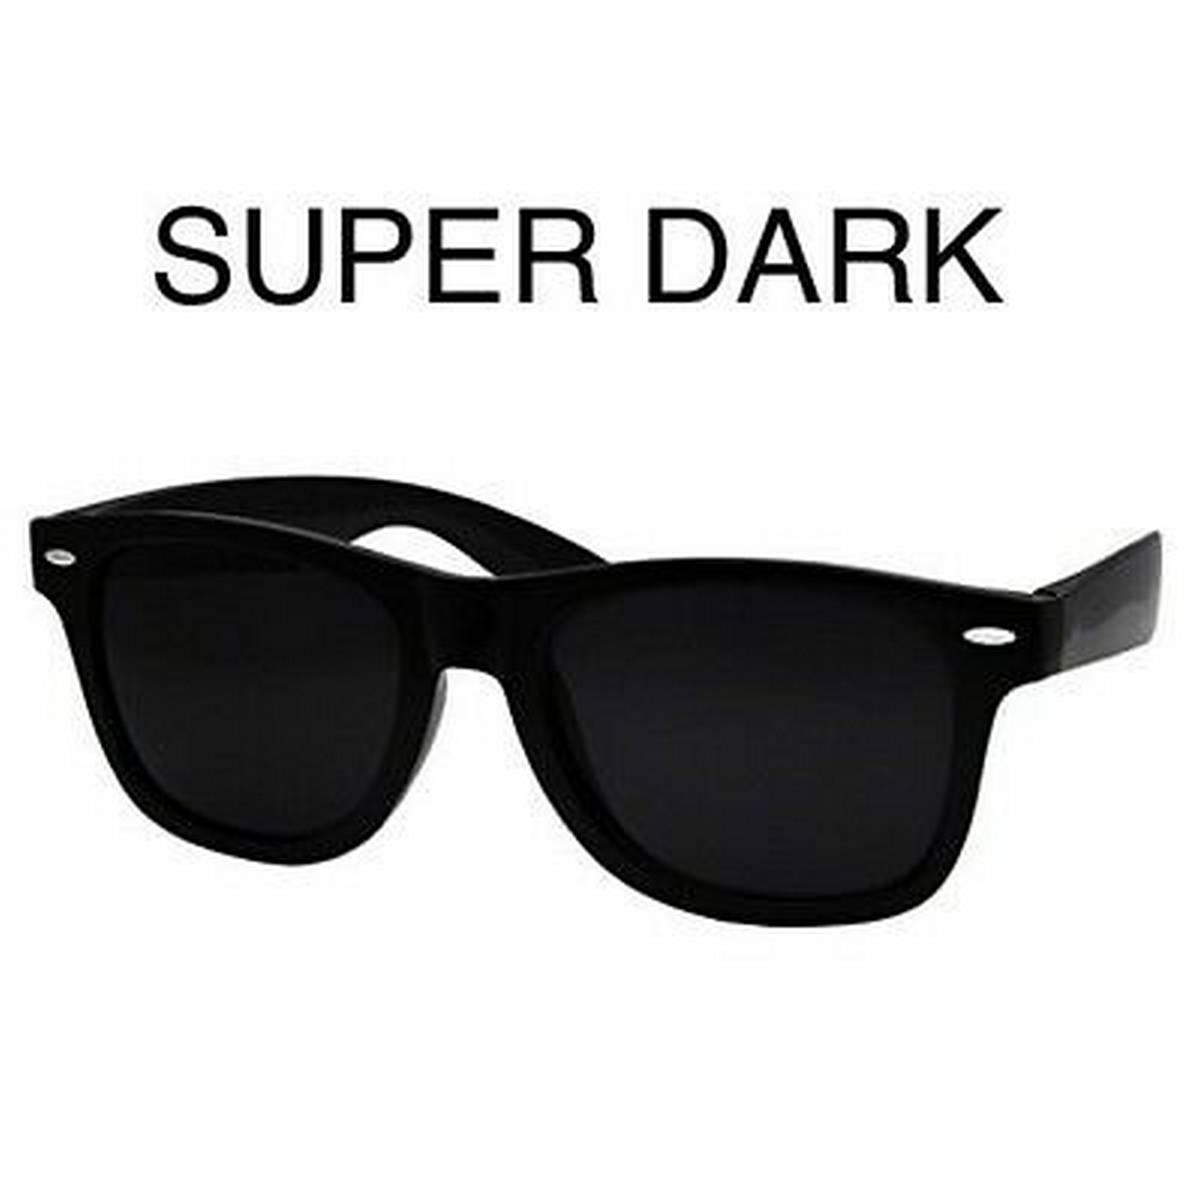 Square Style Sunglasses Polarized Lens Vintage Eyewear Accessories Sun Glasses For Men